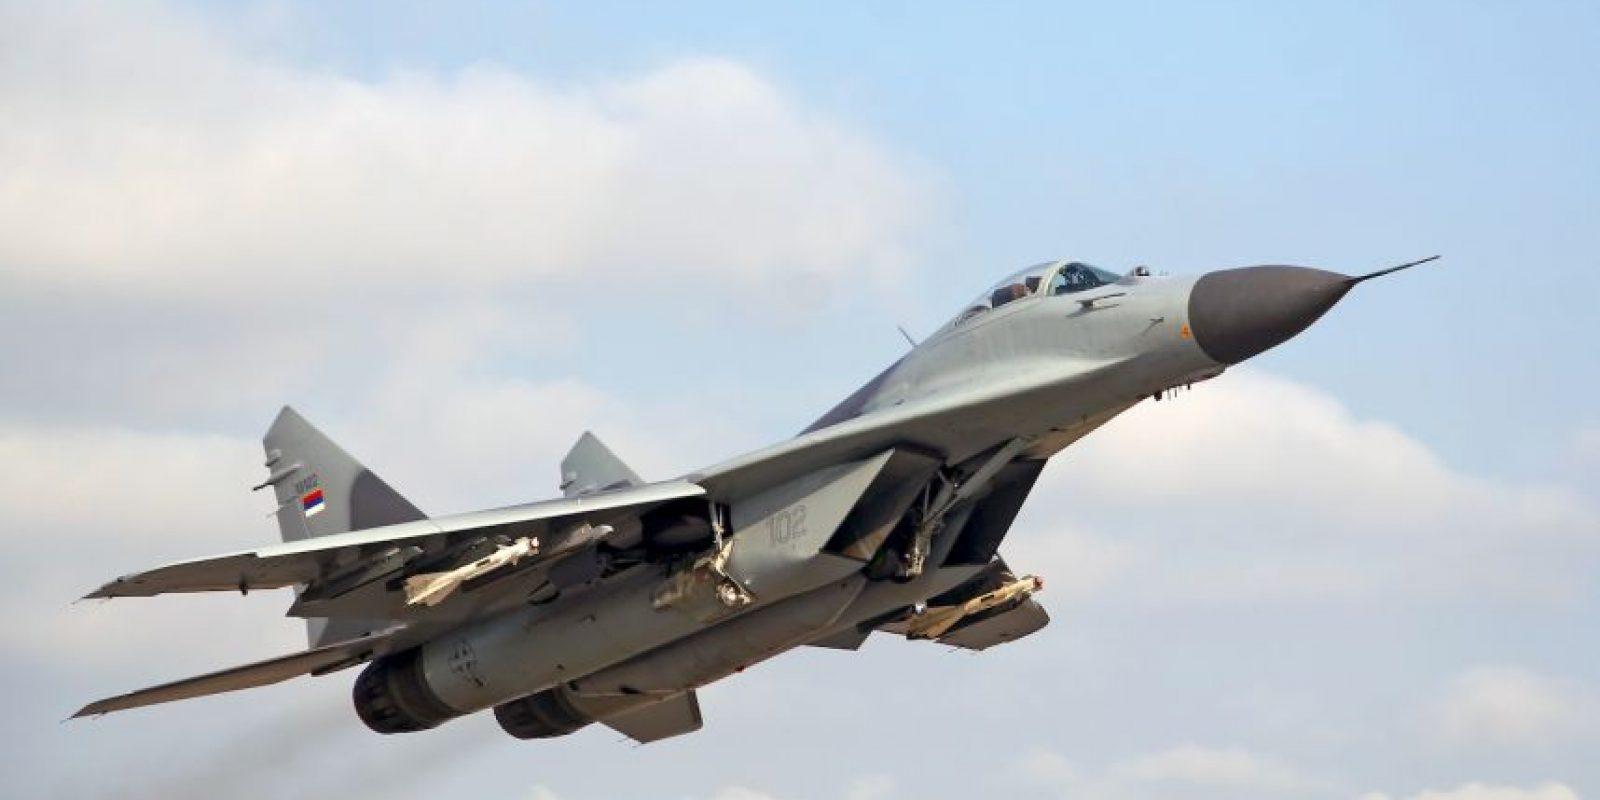 9. MiG-29M. Velocidad máxima de Mach 2,25 (2.756,3 km/h) Foto:Wikimedia